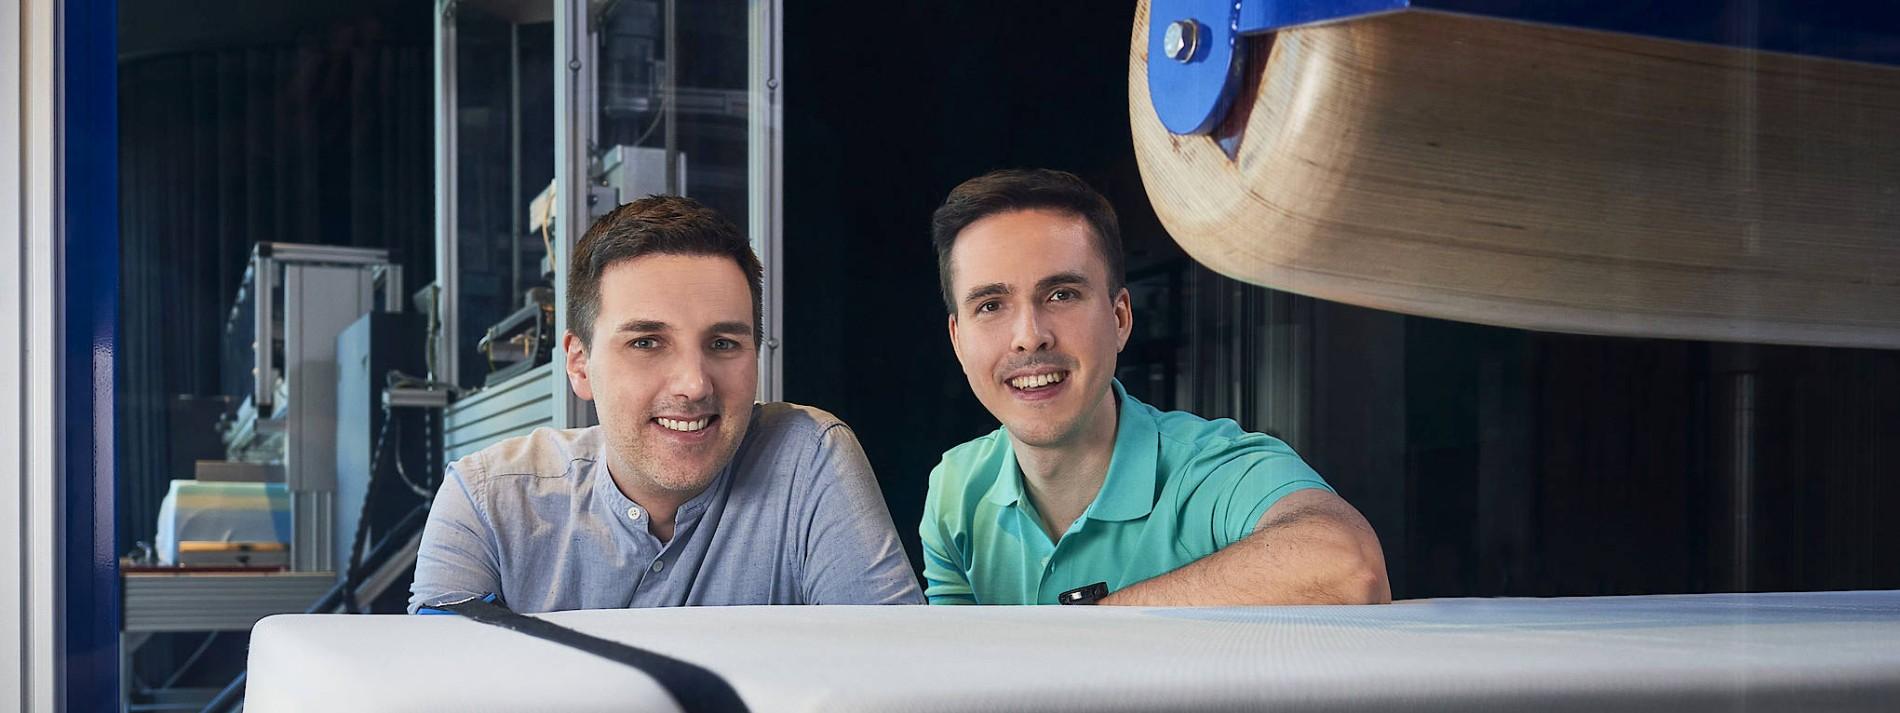 Frankfurter Start-up Emma verkauft Millionste Matratze